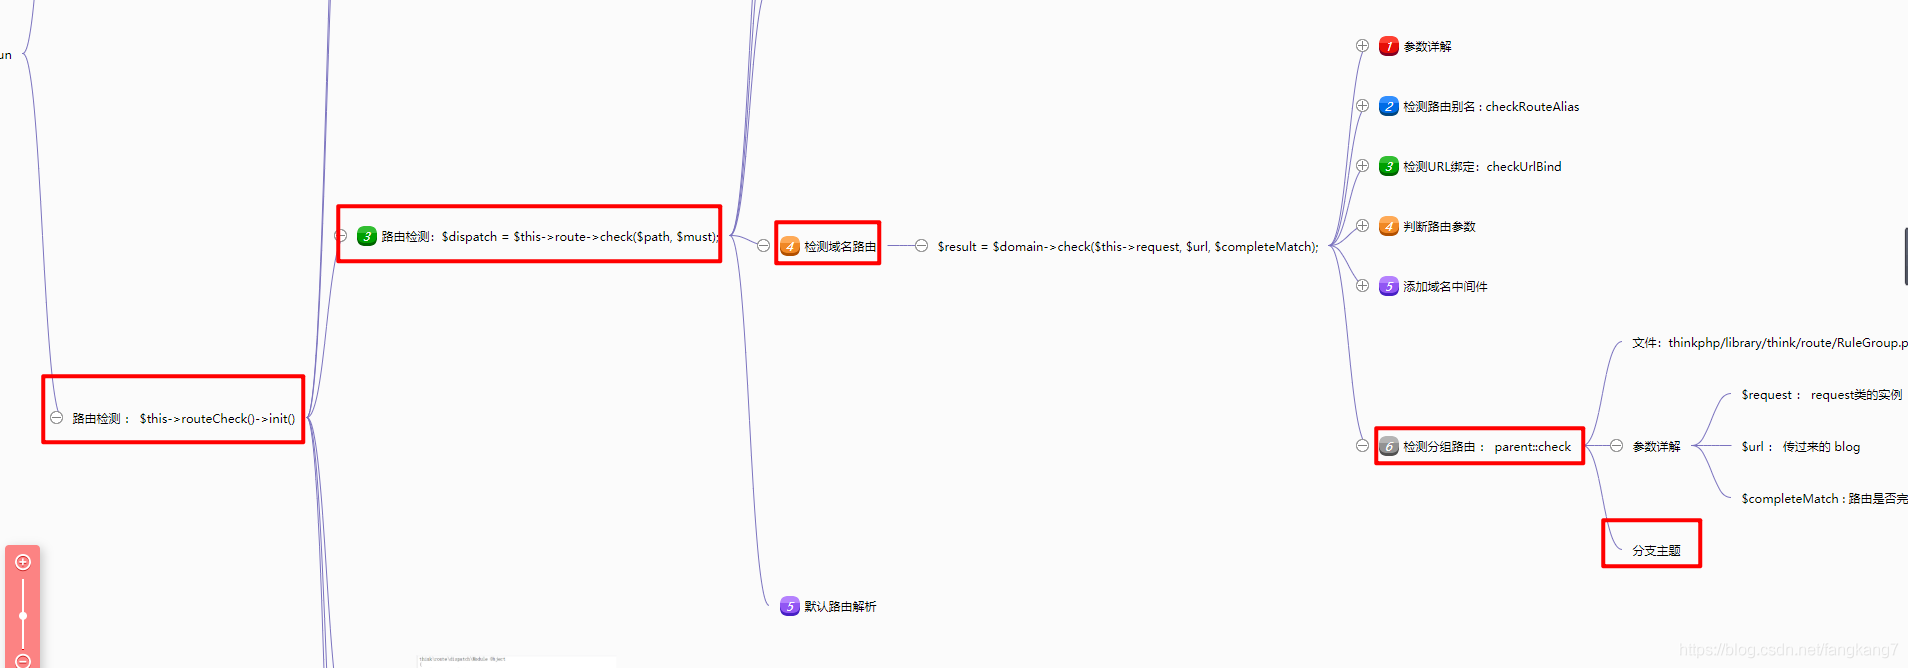 ThinkPHP源码阅读最佳工具debug_backtrace